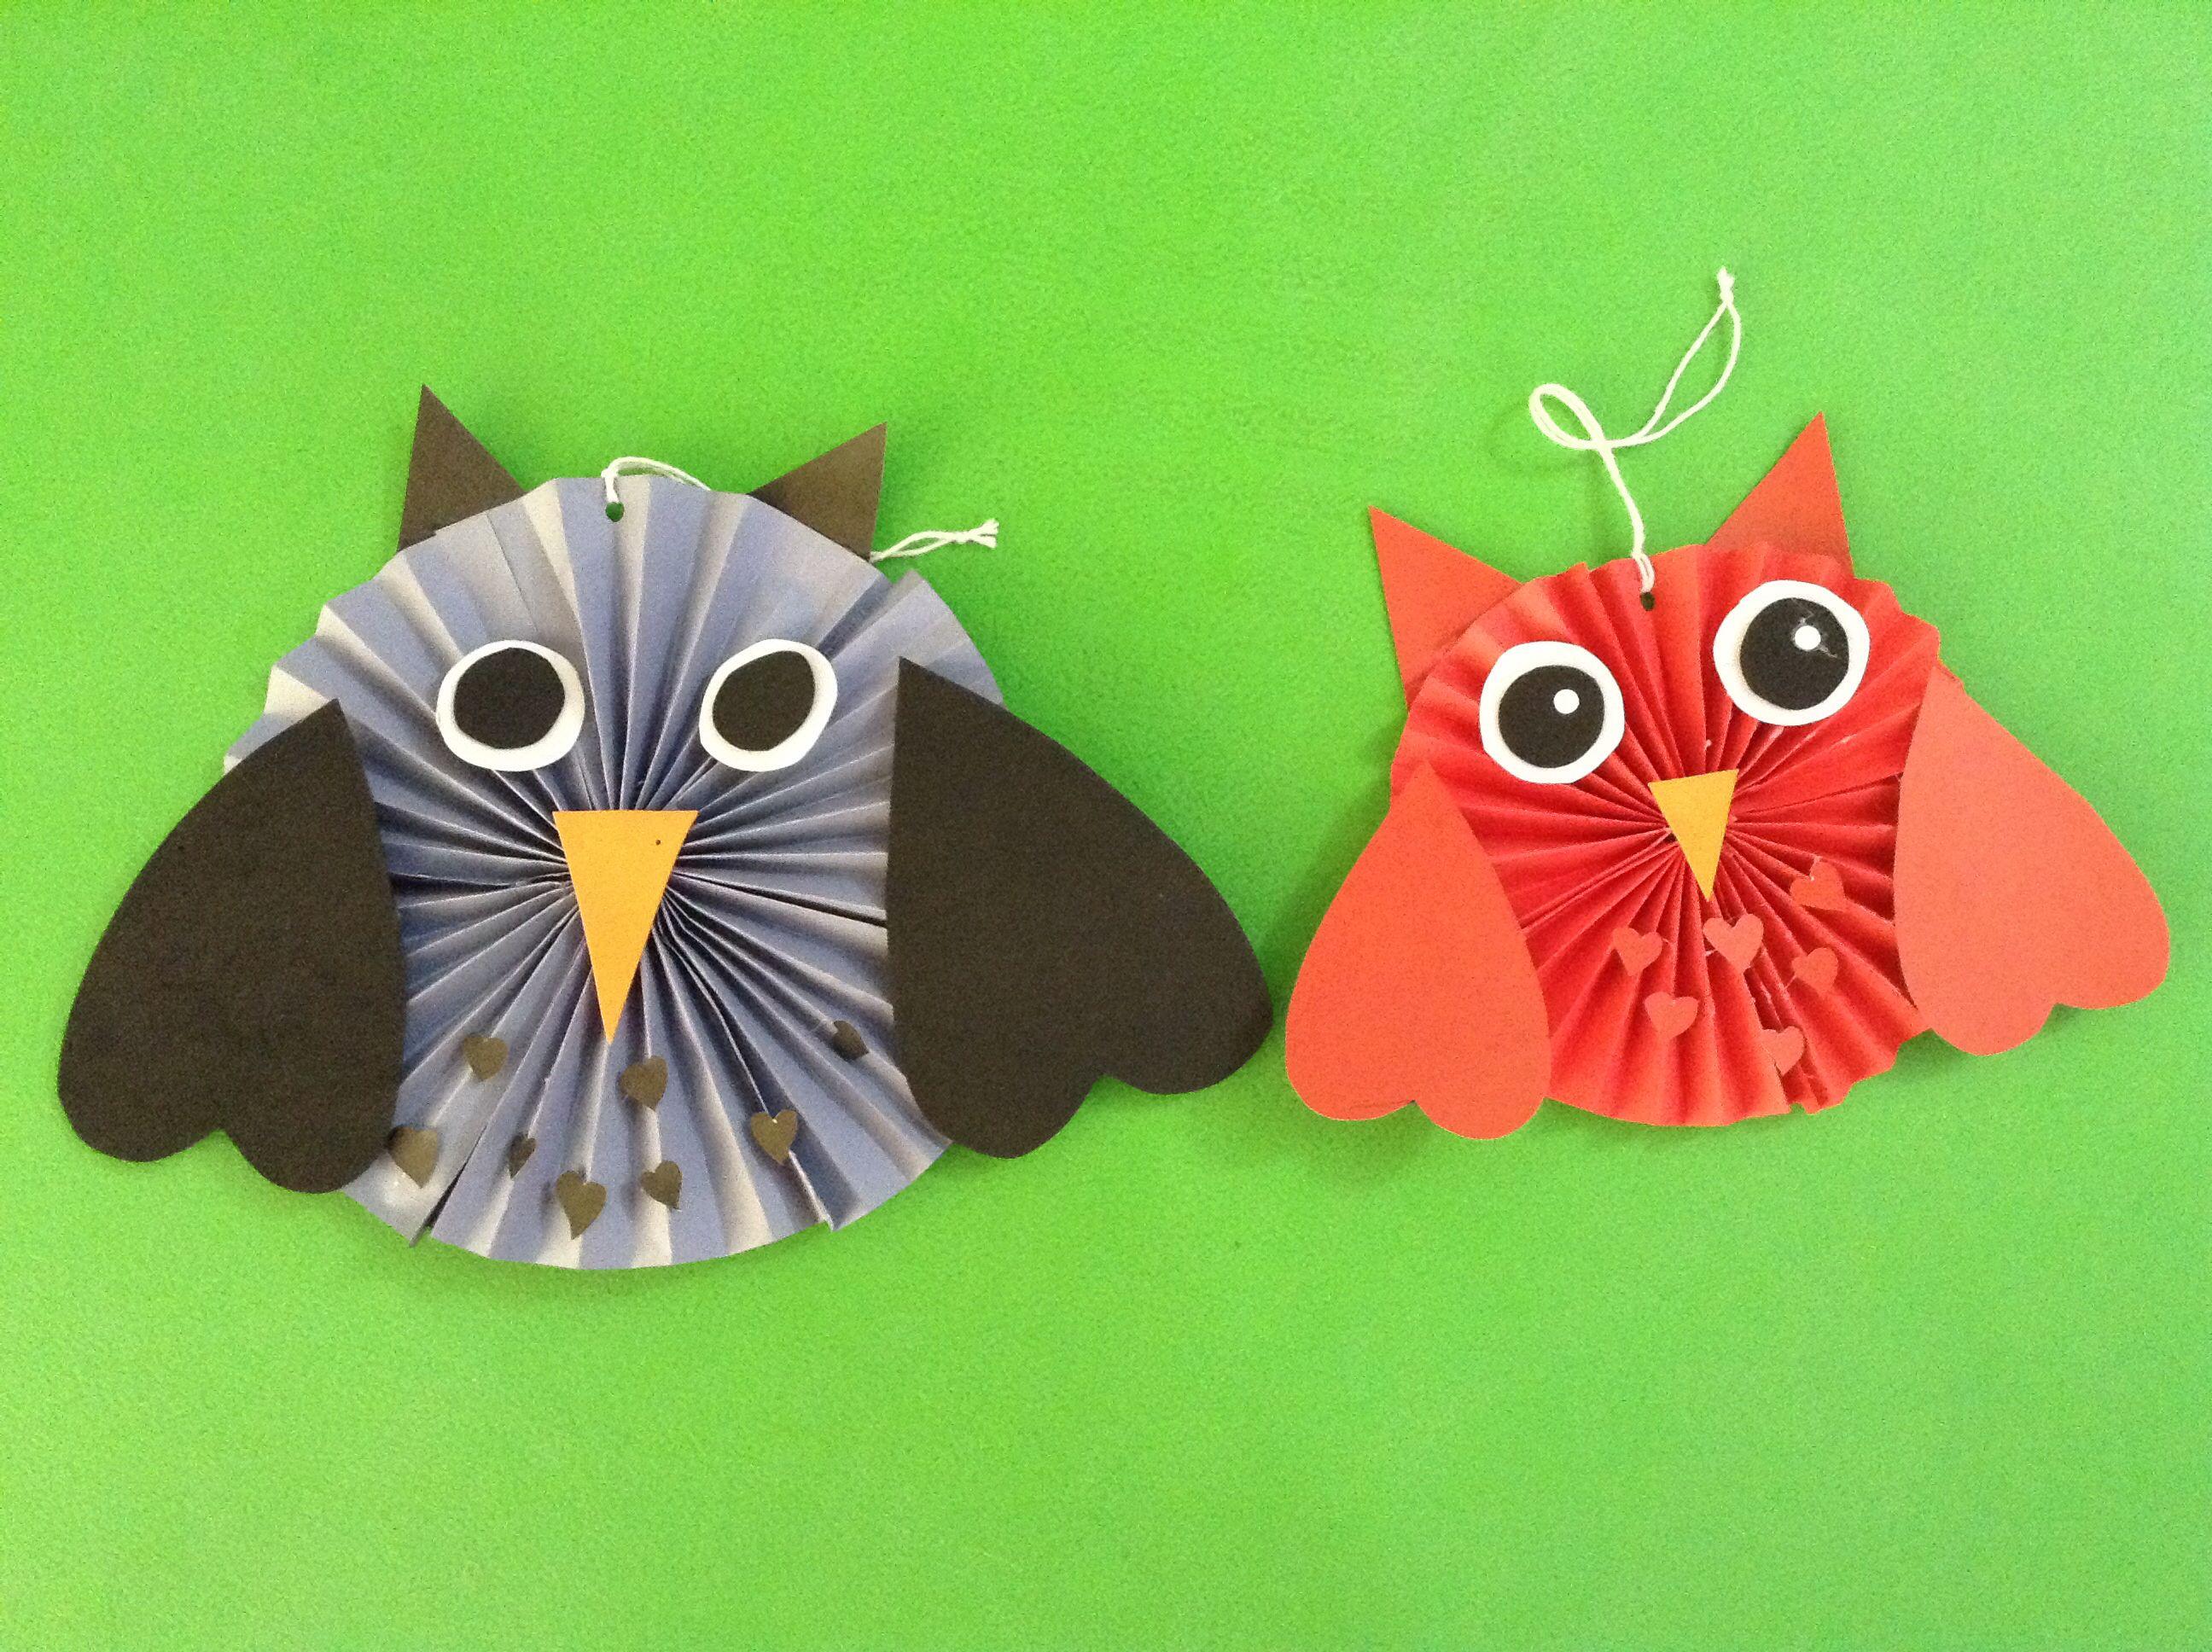 O.... Owl   My Preschool Crafts   Pinterest   Owl and Crafts